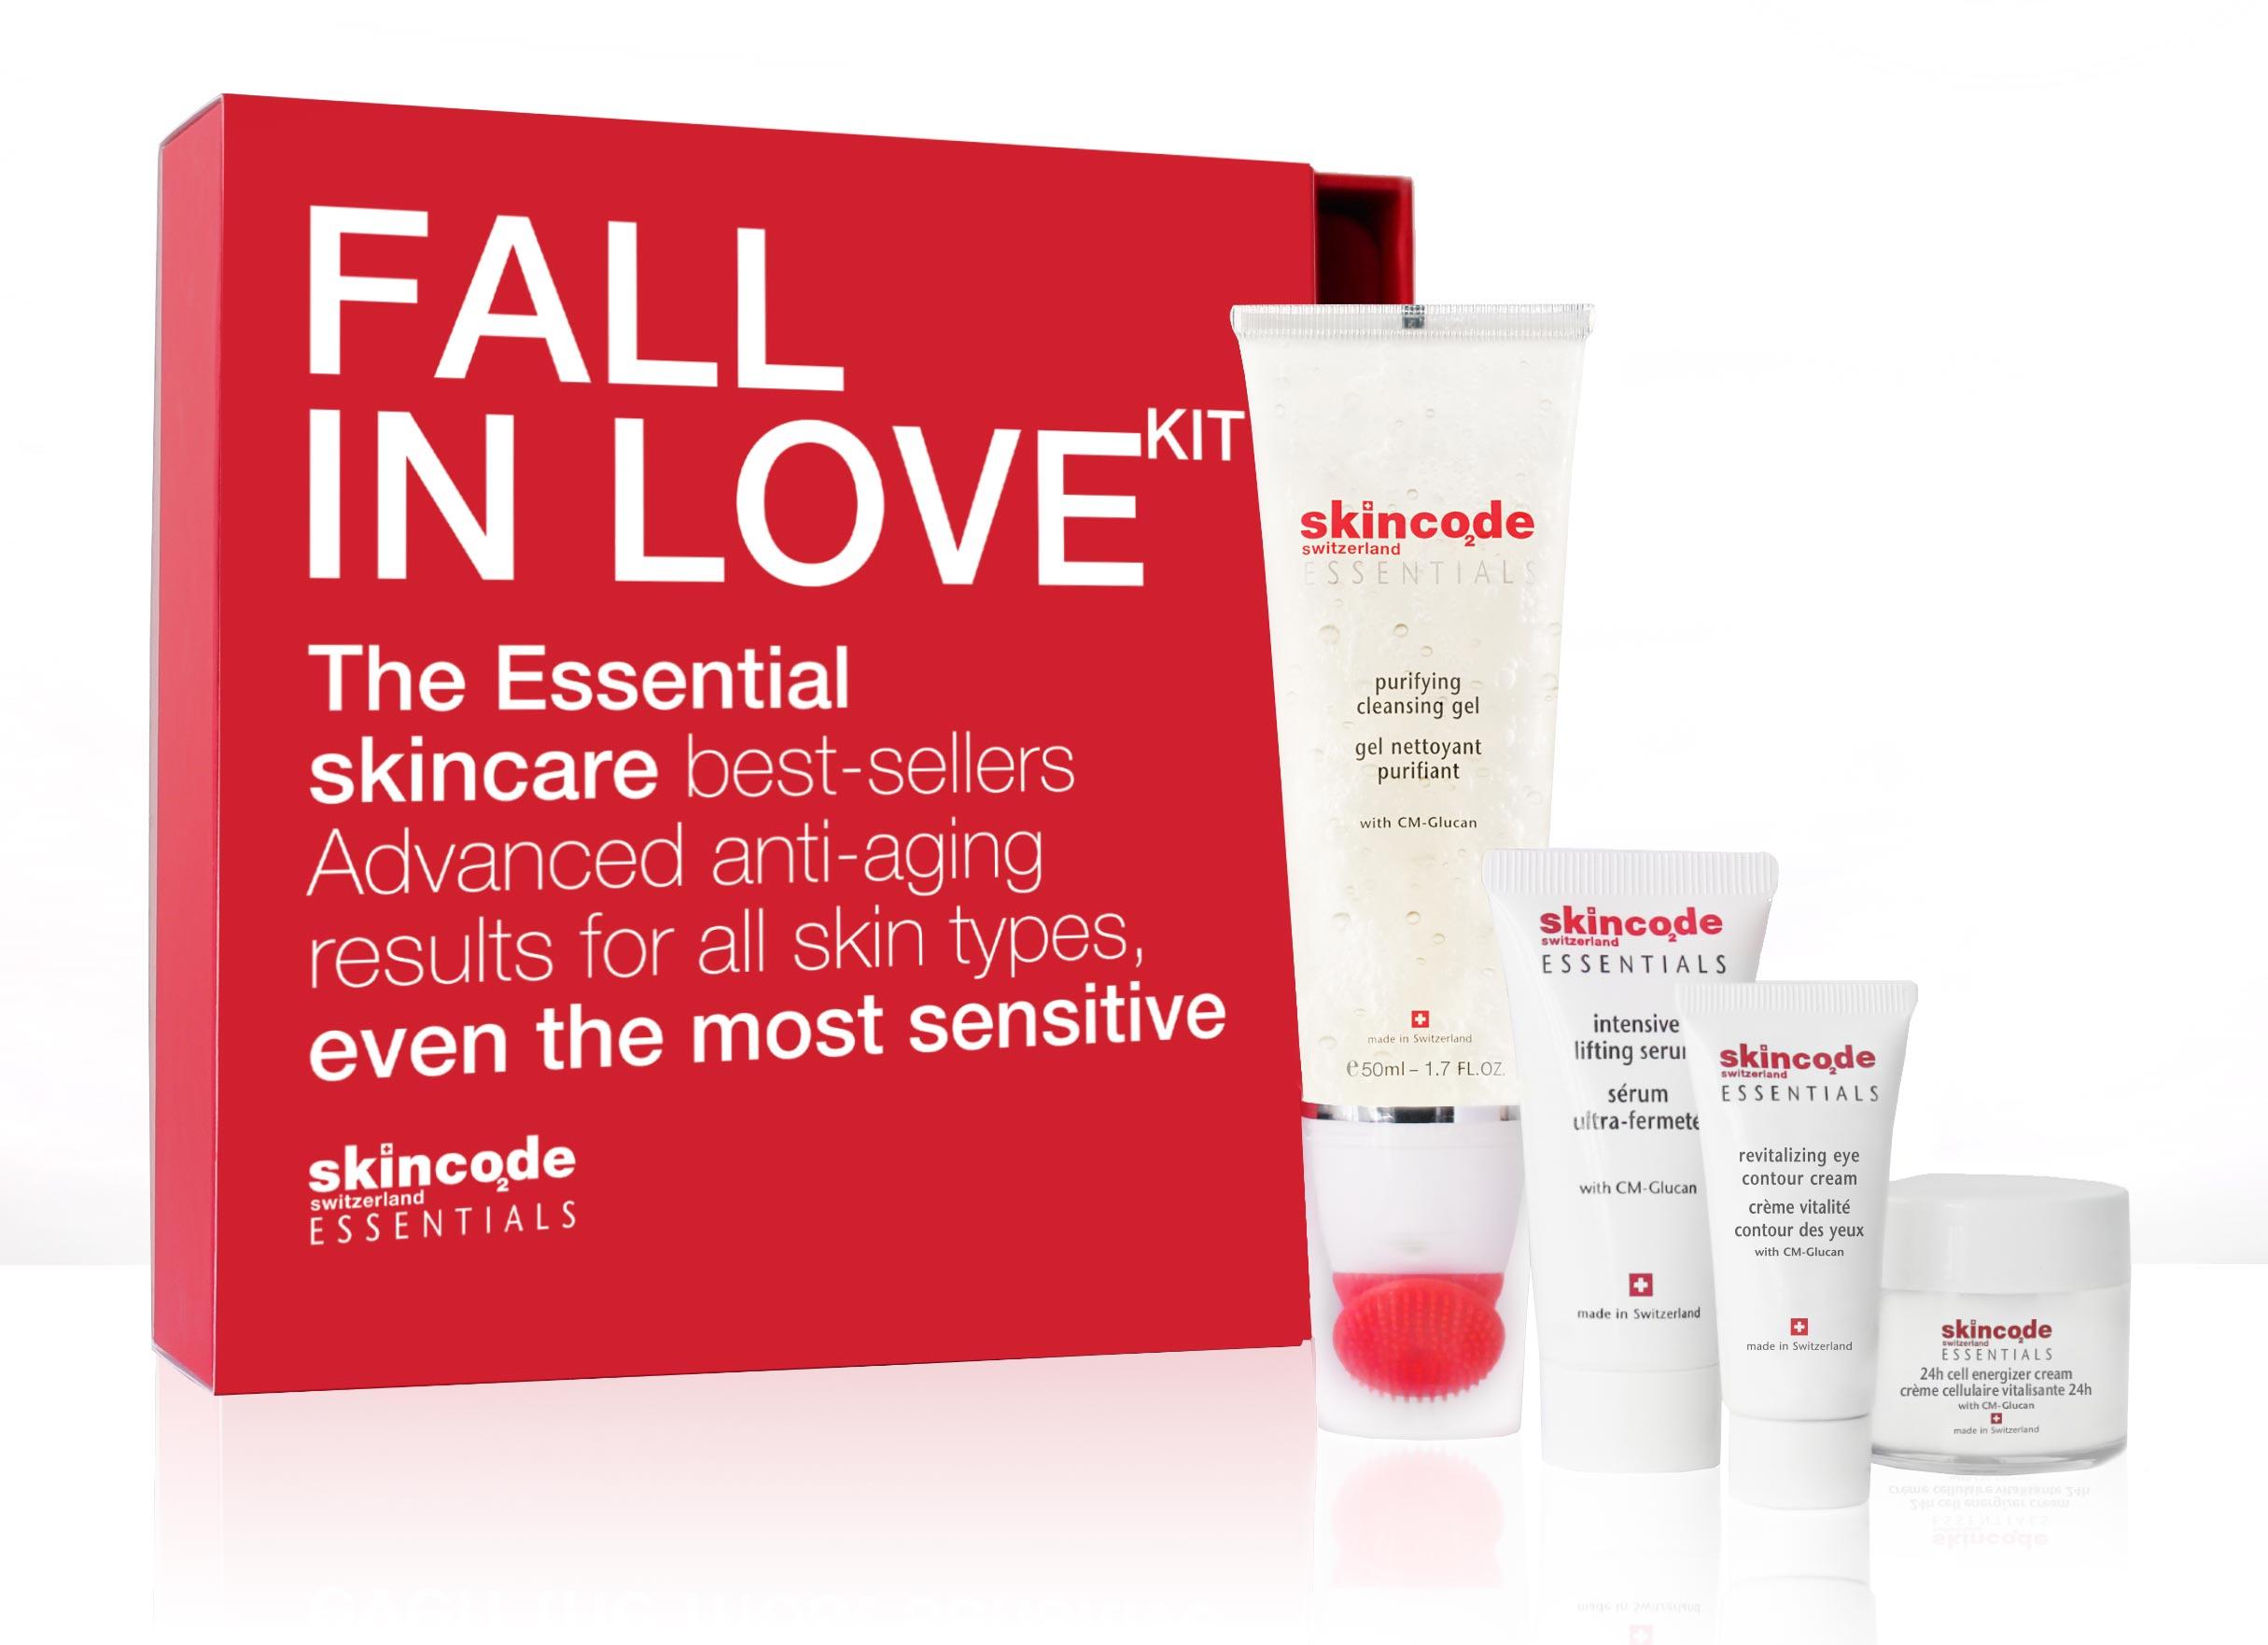 Skincode Fall In Love Kit - набор бестселлеров для путешествий